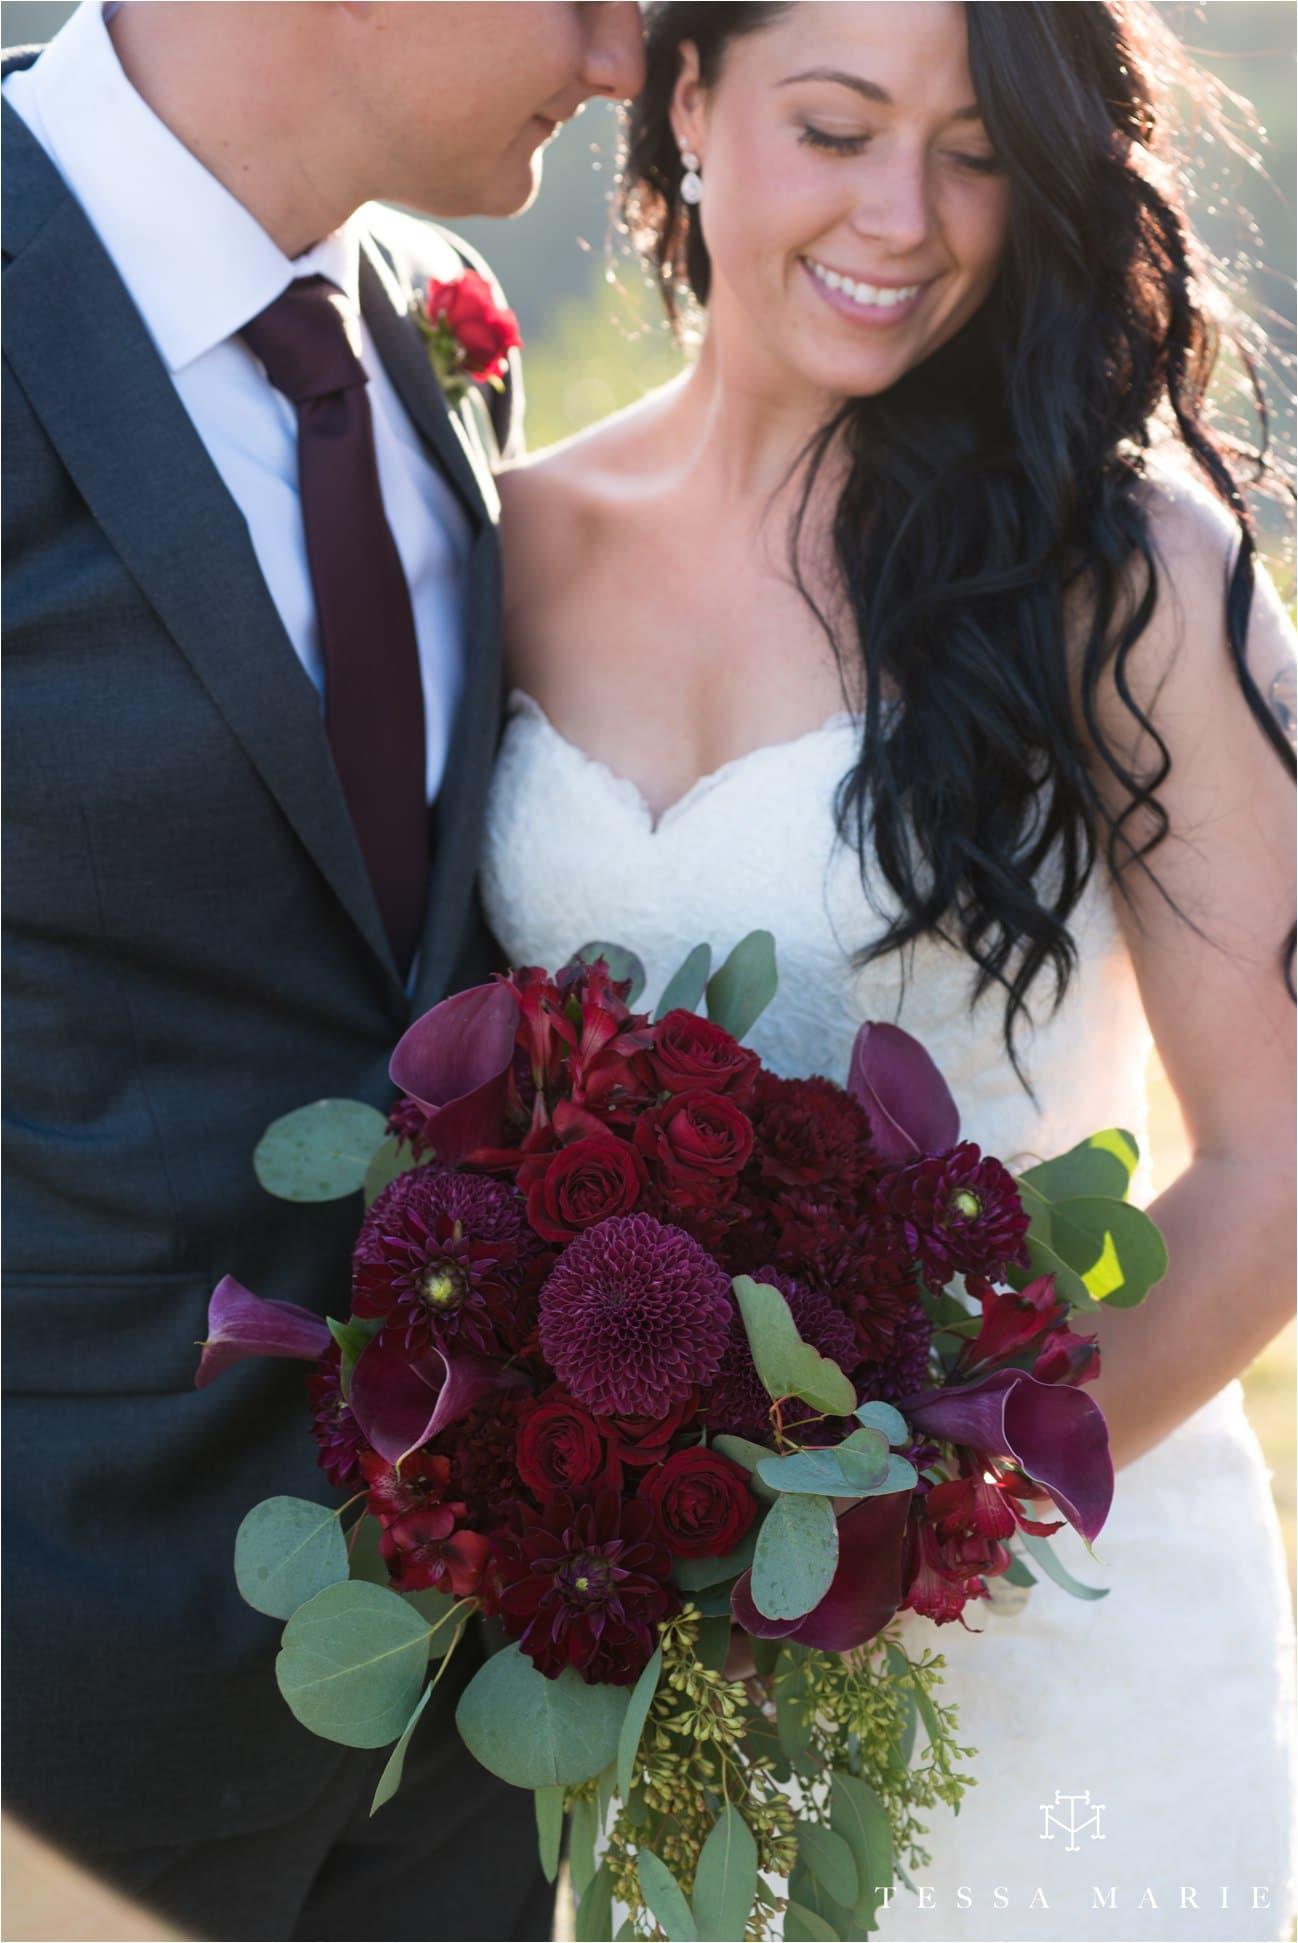 tessa_marie_weddings_rivermill_event_centere_candid_outdoor_wedding_photos_0254